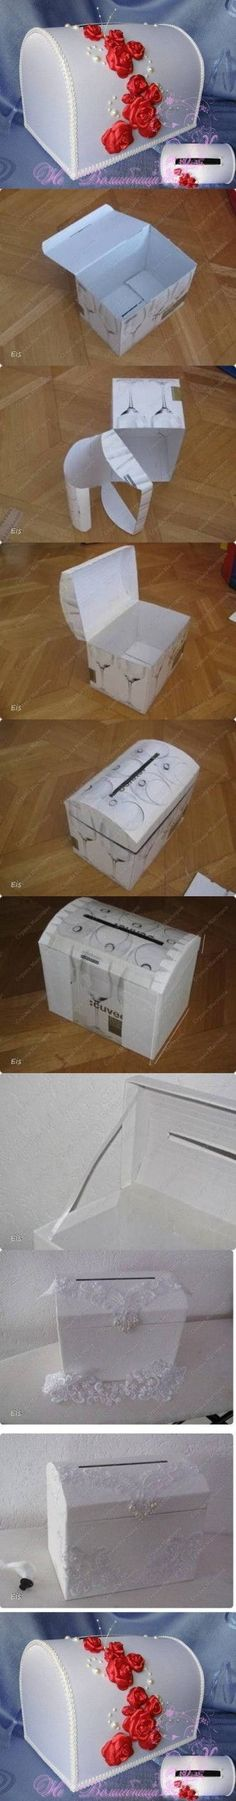 DIY Cardboard Box Art DIY Projects